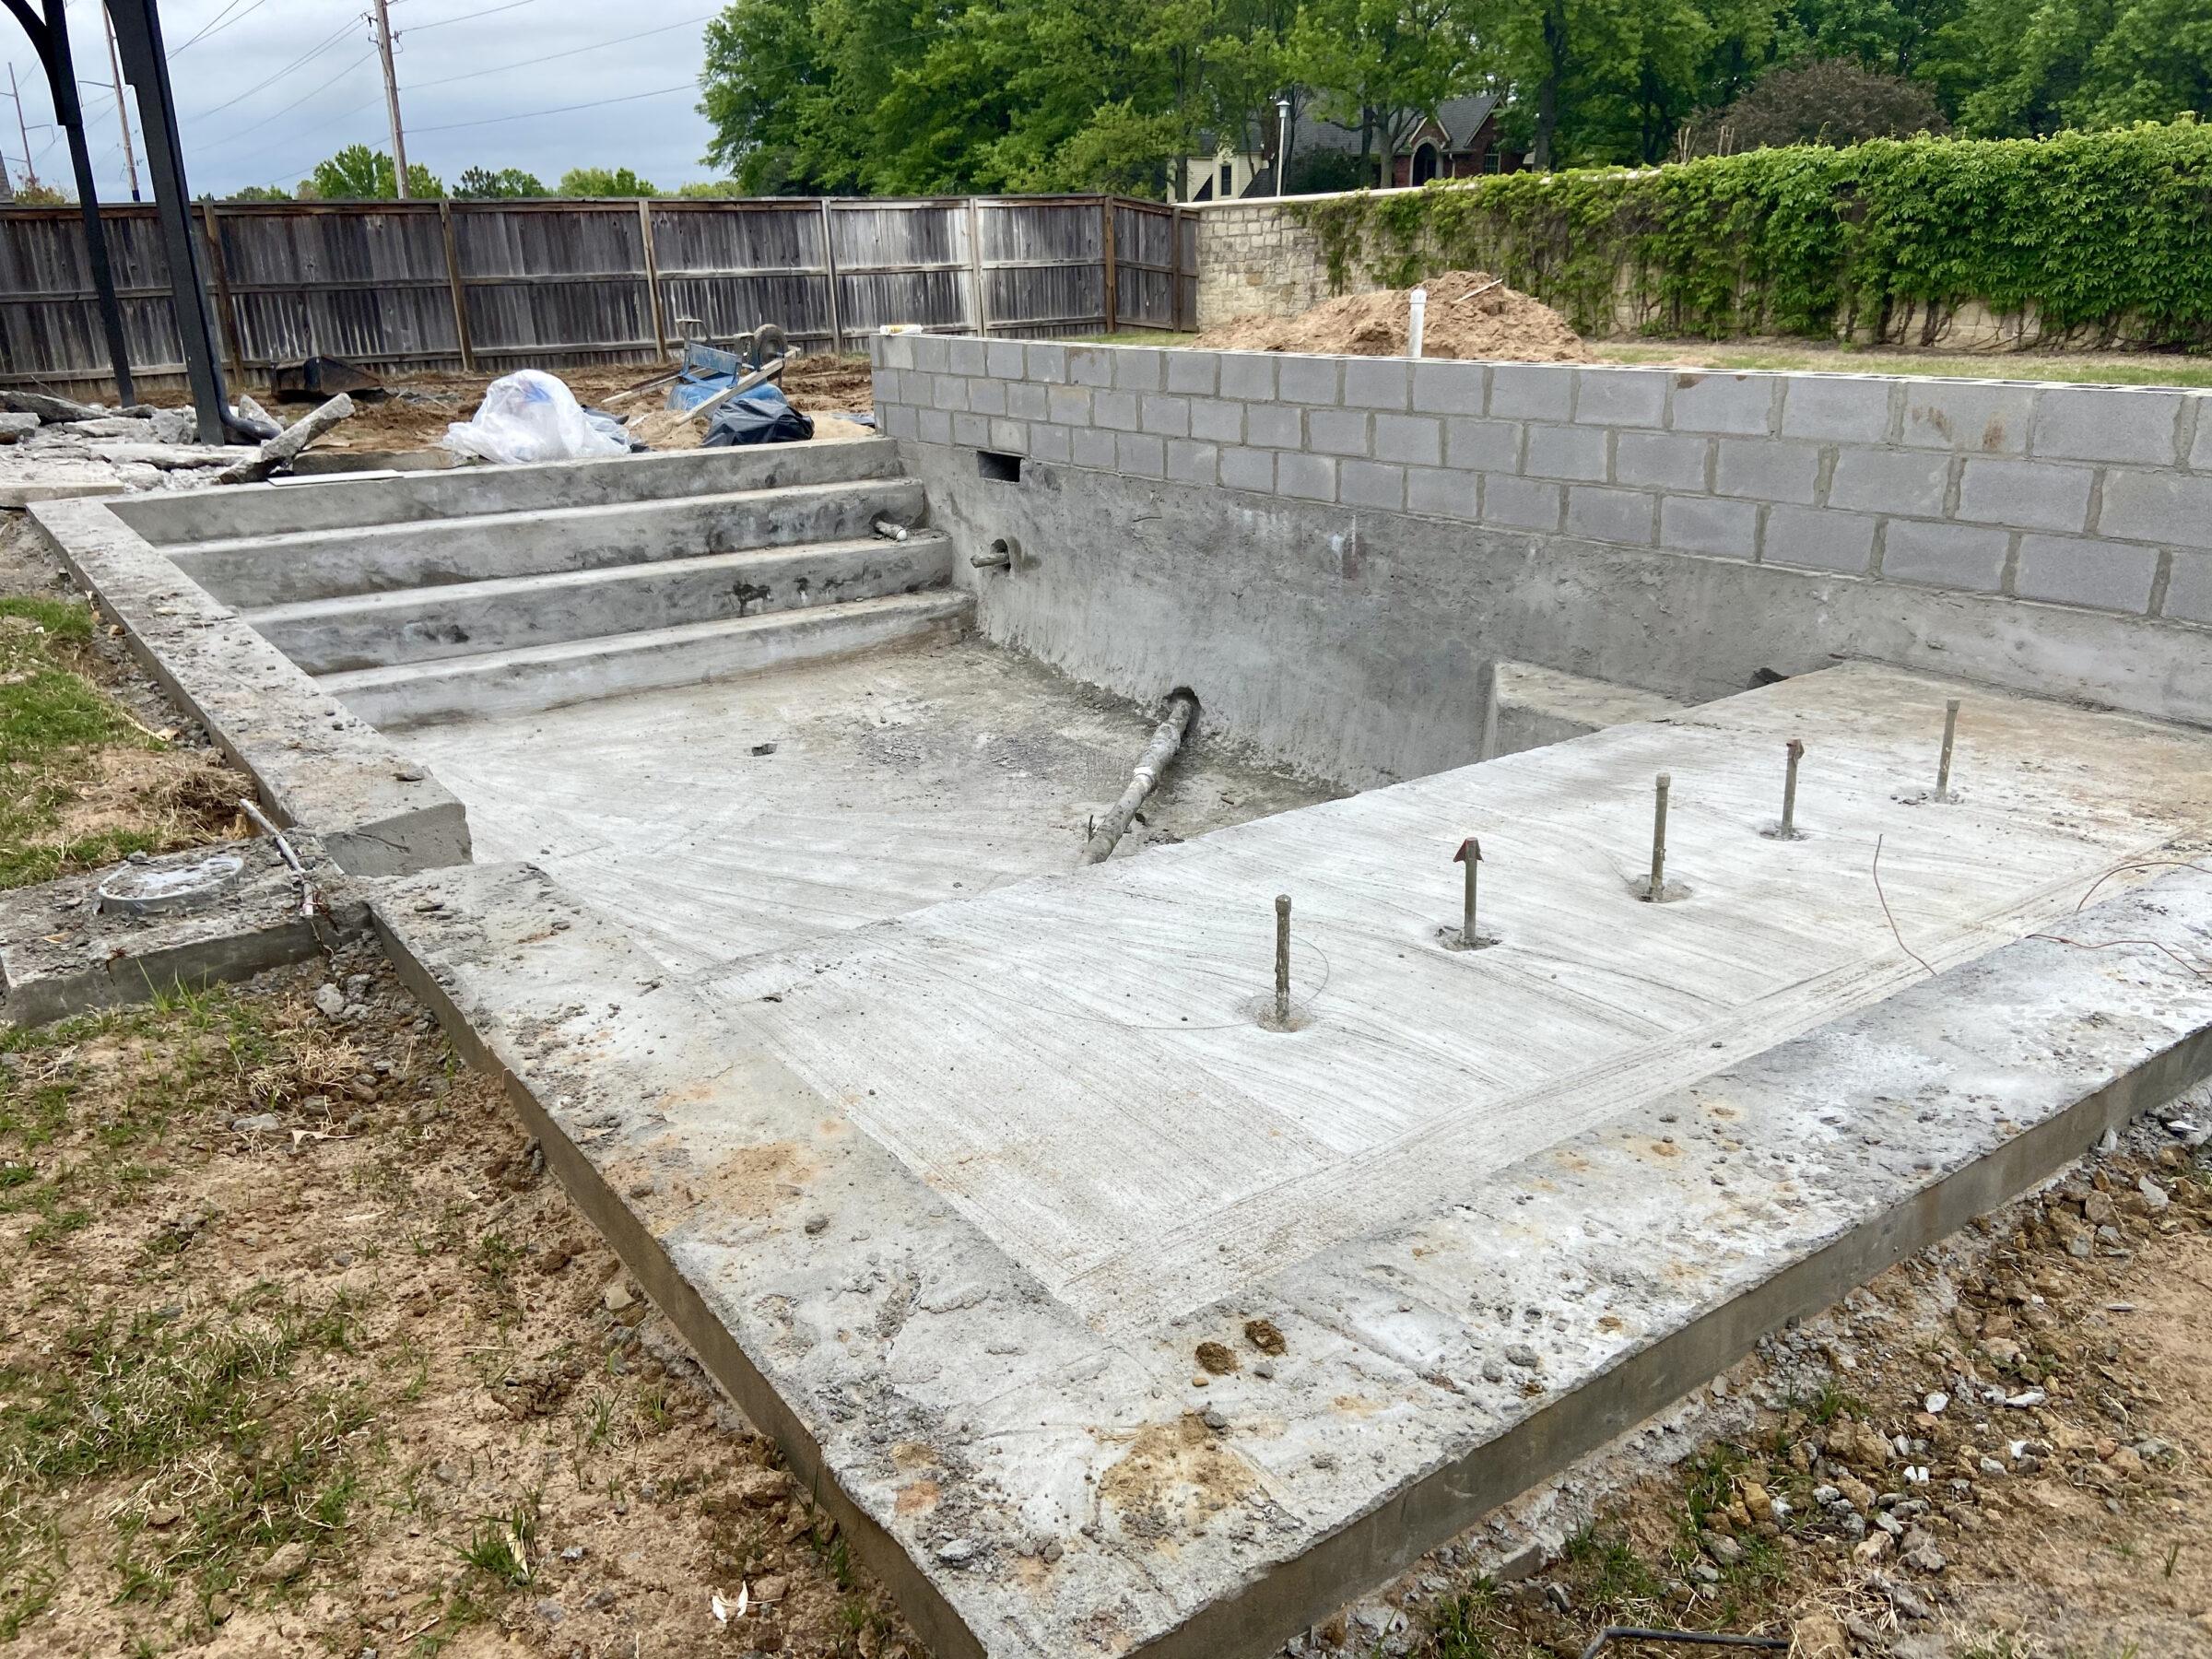 2021 04 South Tulsa Custom Gunite Pool Deck Outdoor Kitchen 9F342A526A4C